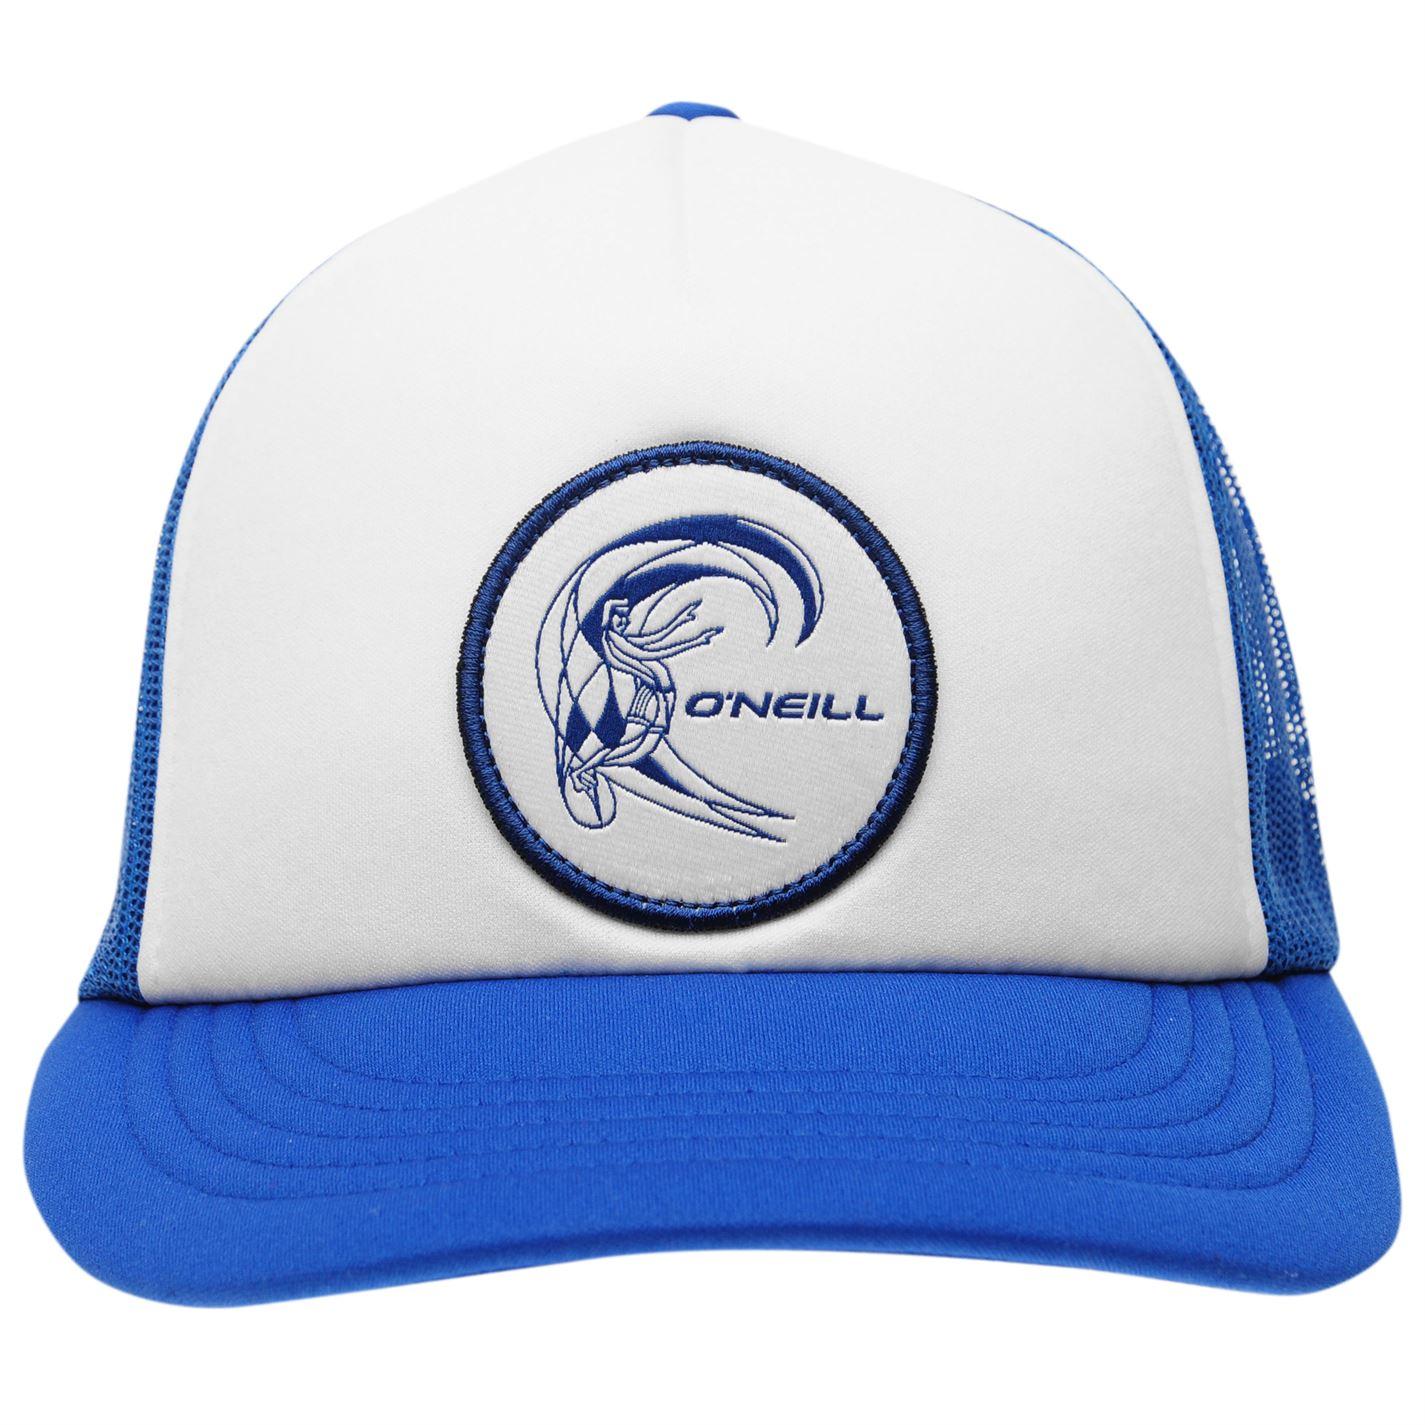 ONeill camionista Cappello Uomo Gents Baseball Snapback Mesh